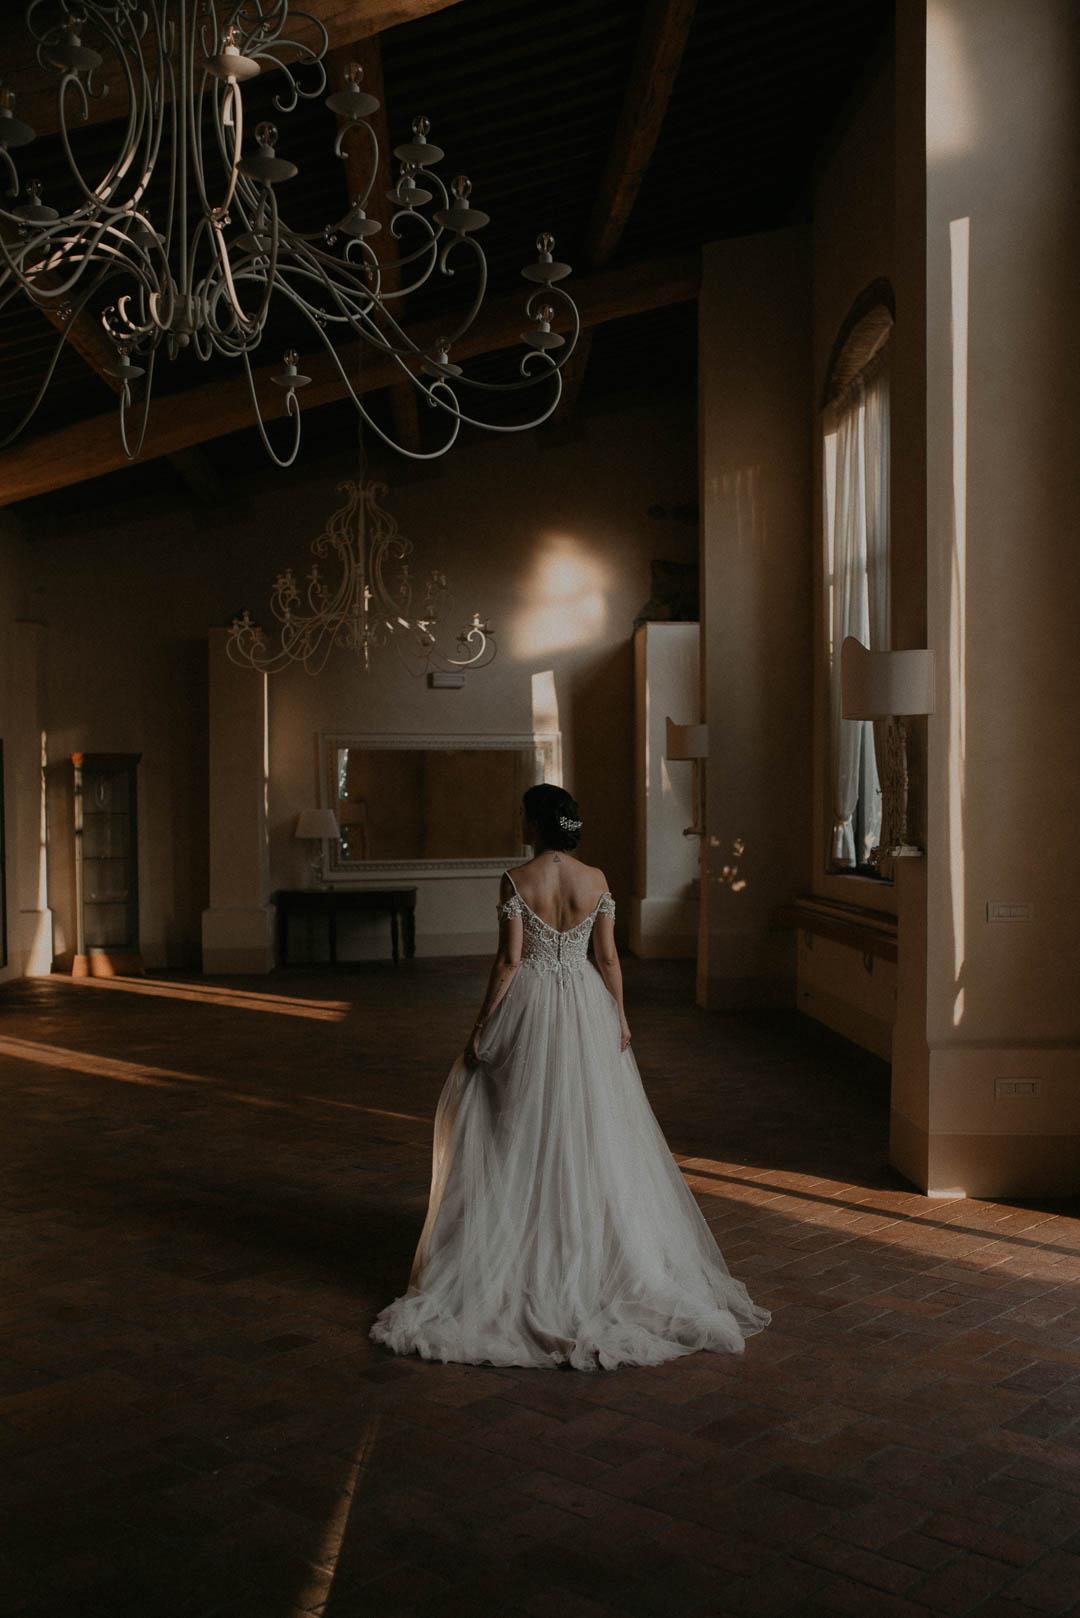 wedding-photographer-destination-fineart-bespoke-reportage-tuscany-villascorzi-vivianeizzo-spazio46-121